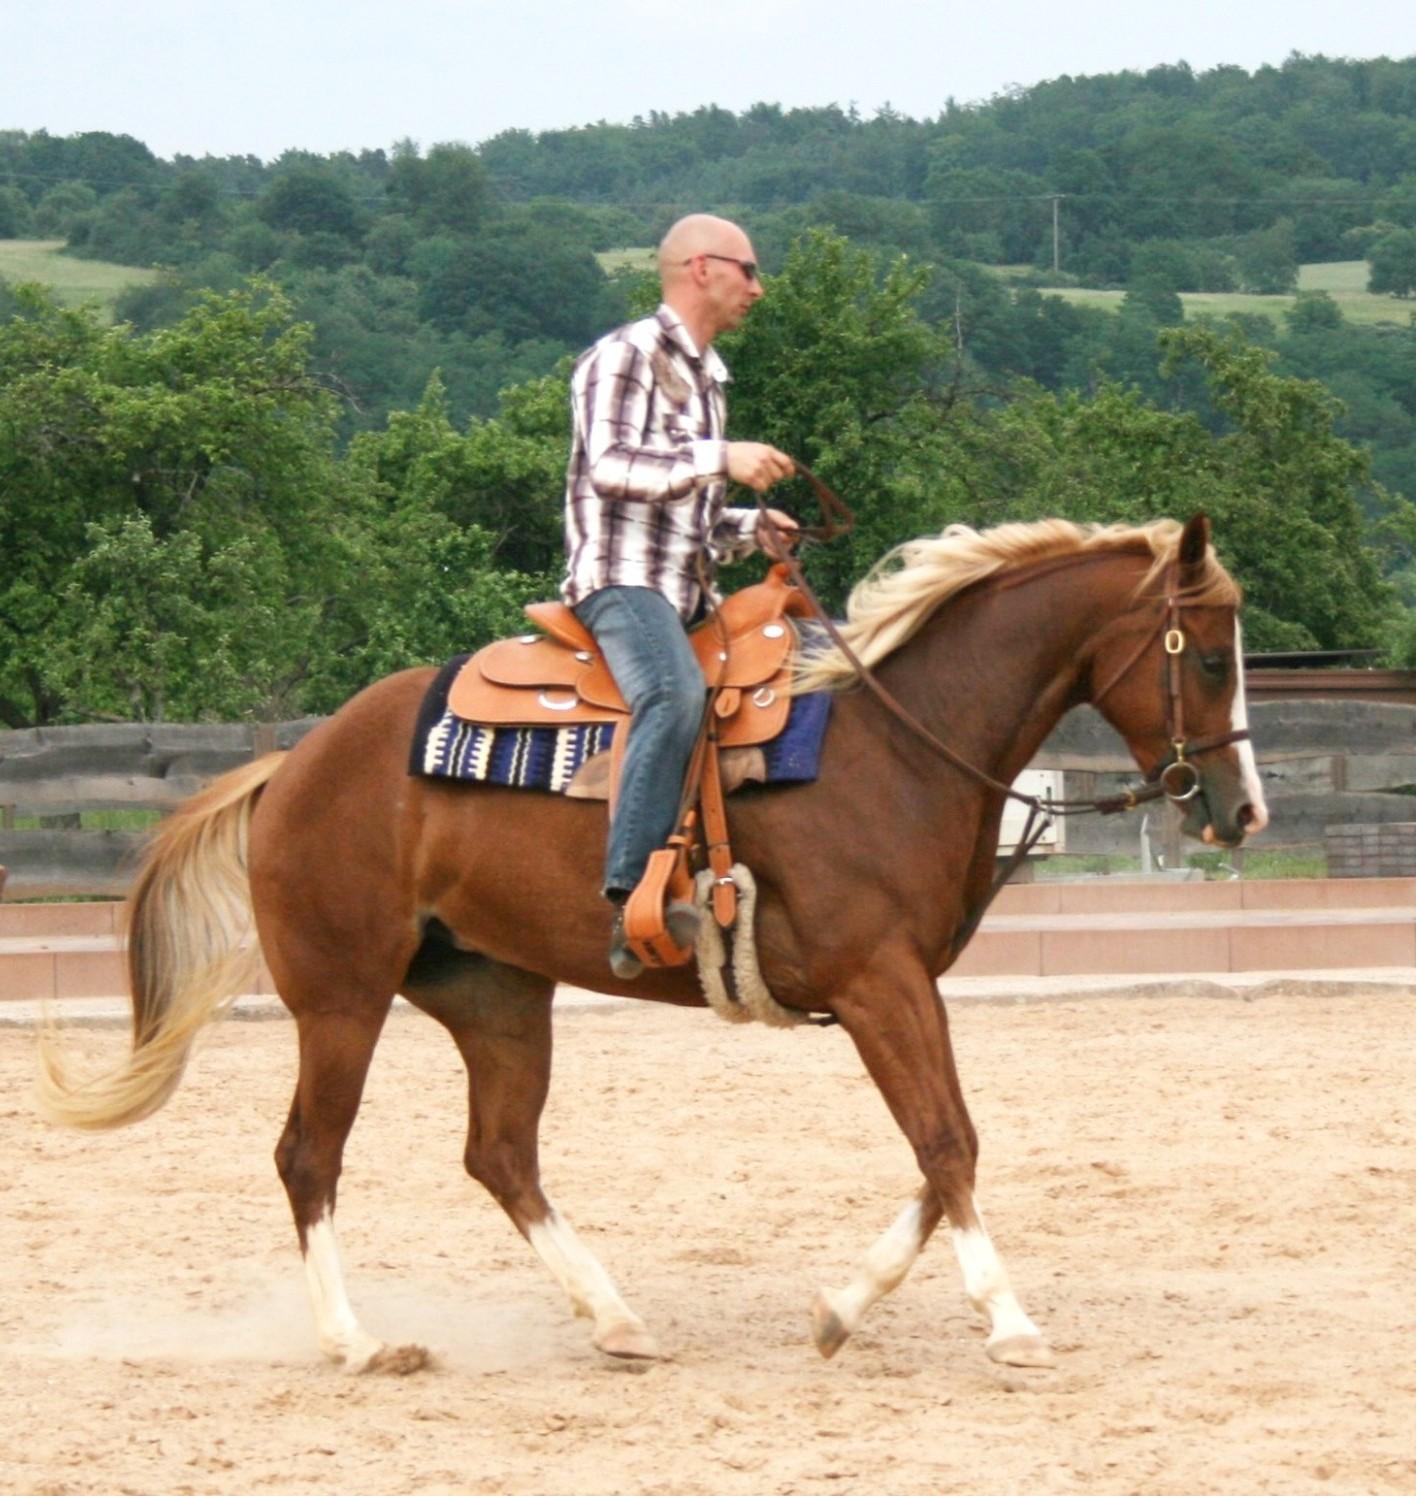 Http Kbd Wikipedia Org Wiki Western Riding Jpg